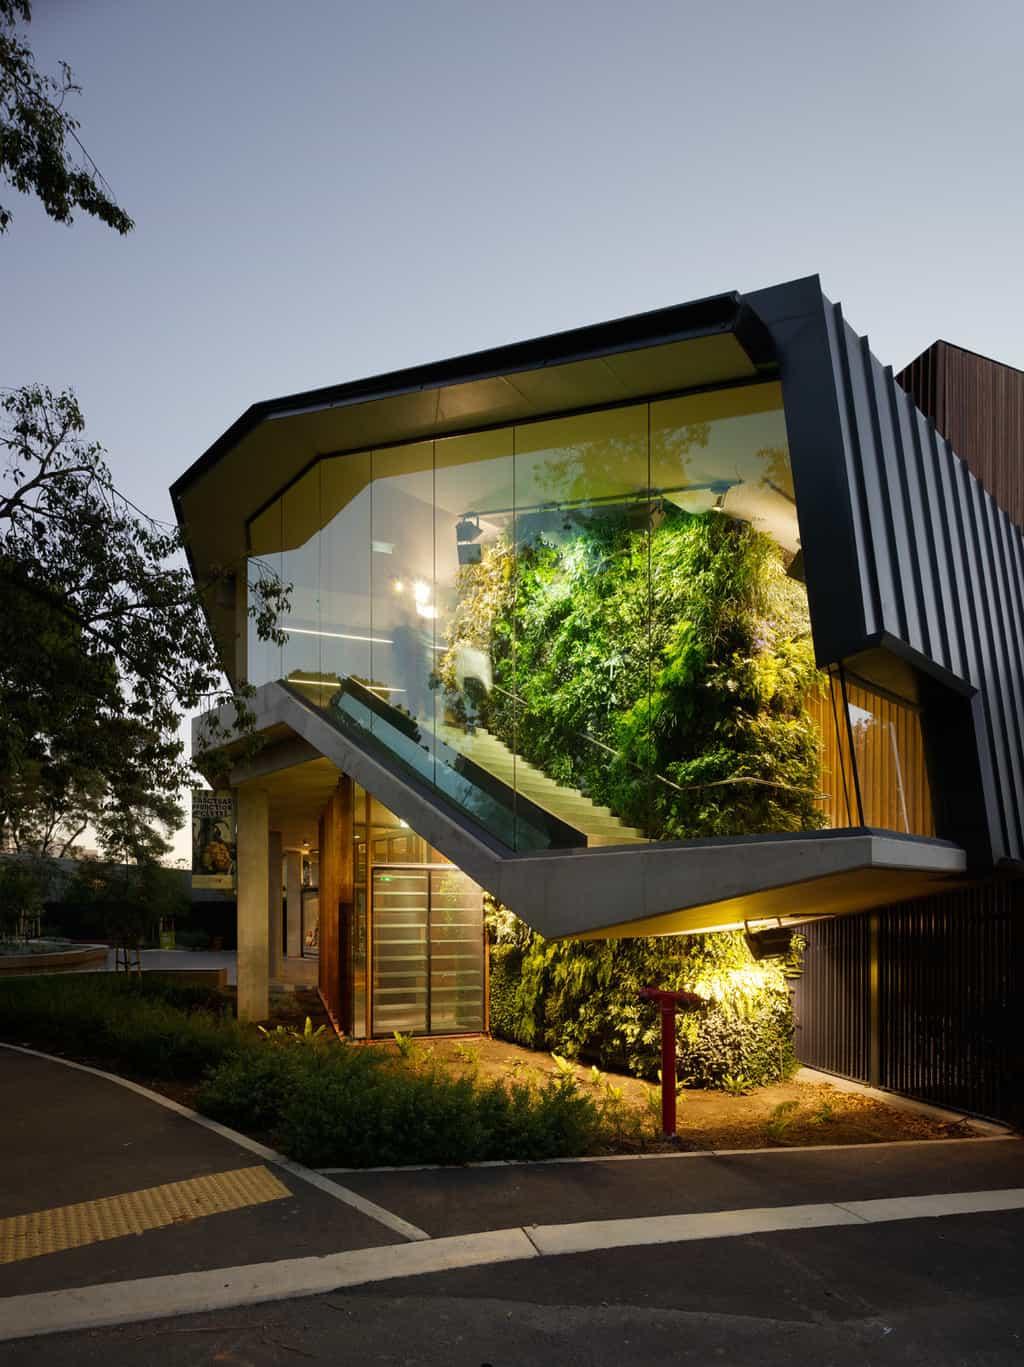 Eco housing design adelaide